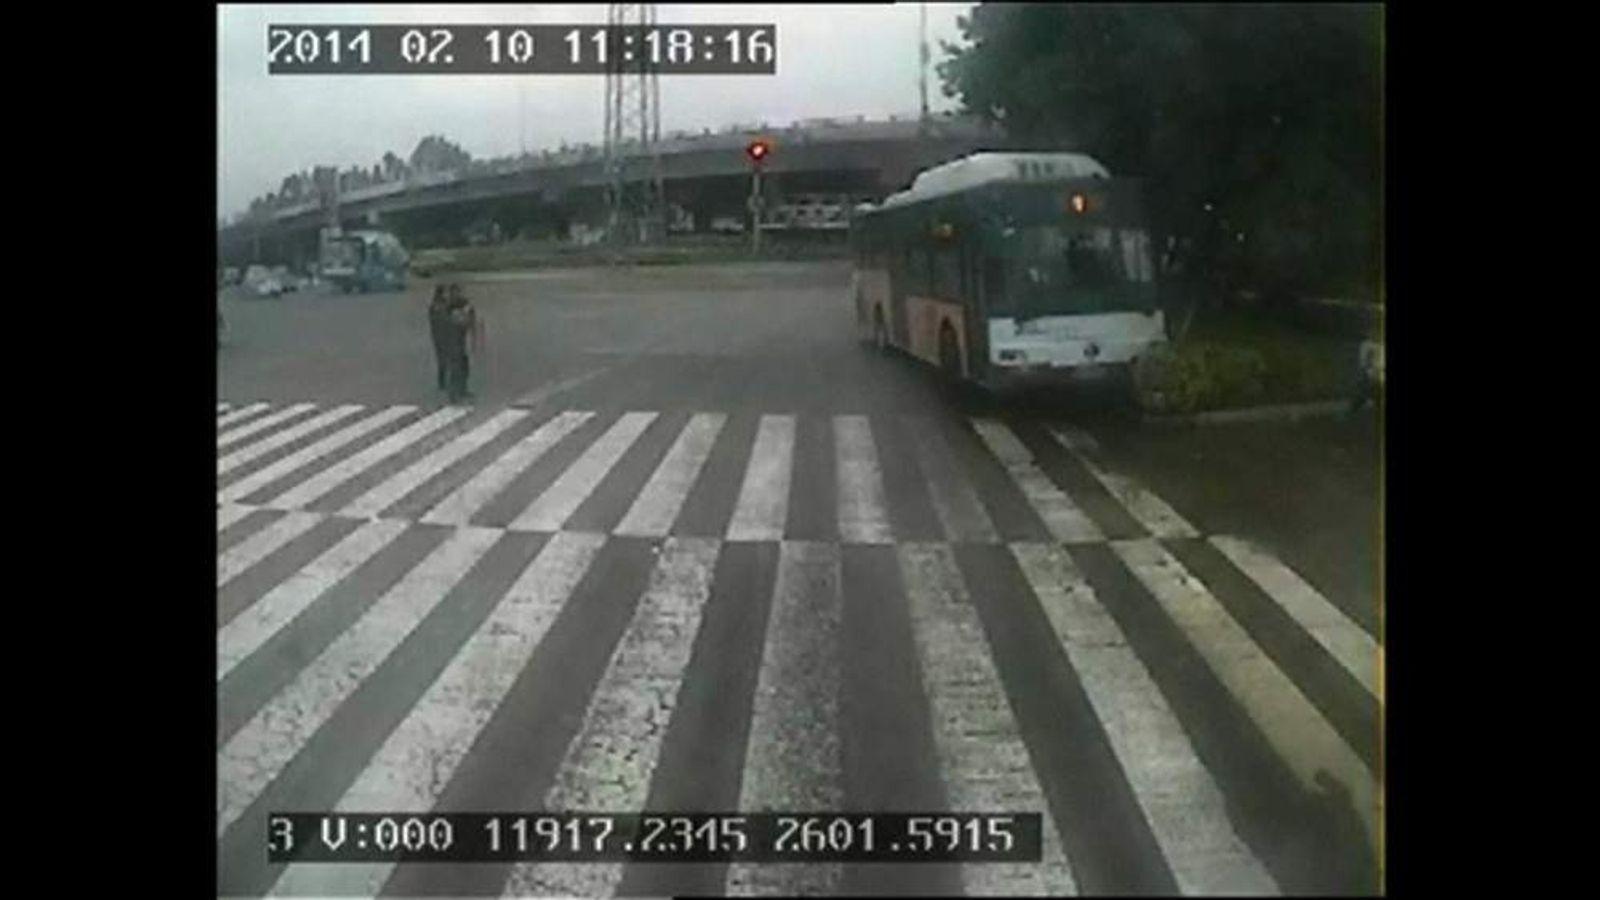 Driver runs after and stops runaway bus